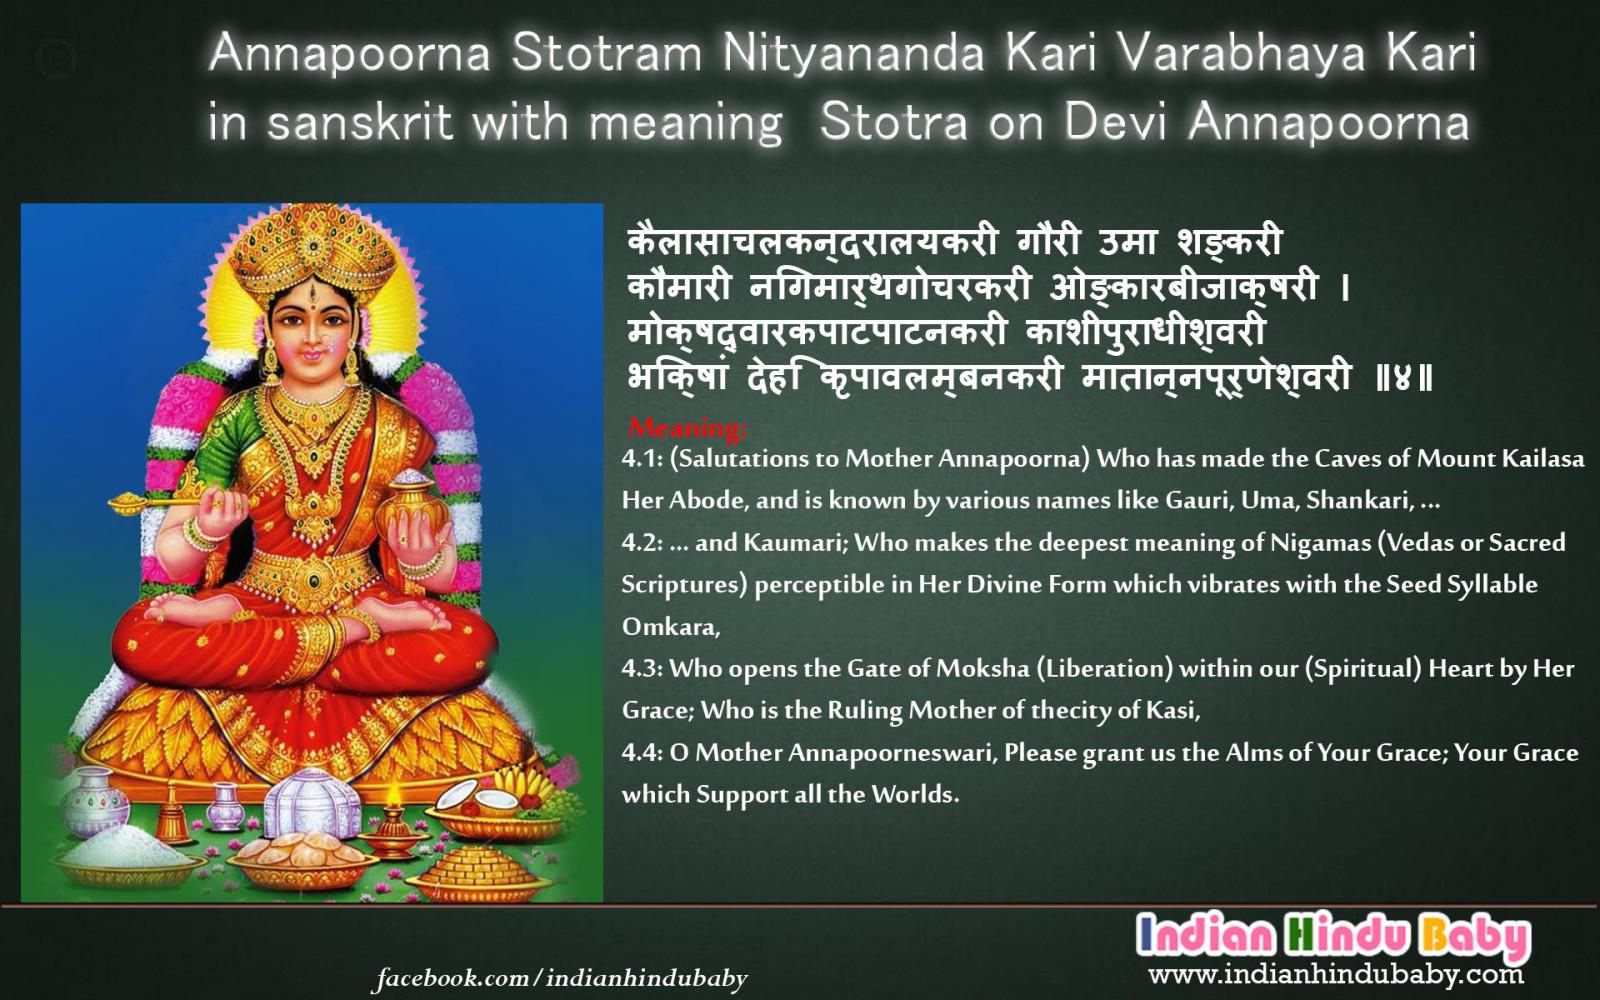 Annapoorna Stotram Nityananda Kari Varabhaya Kari in sanskrit with meaning Stotra on Devi Annapoorna-4